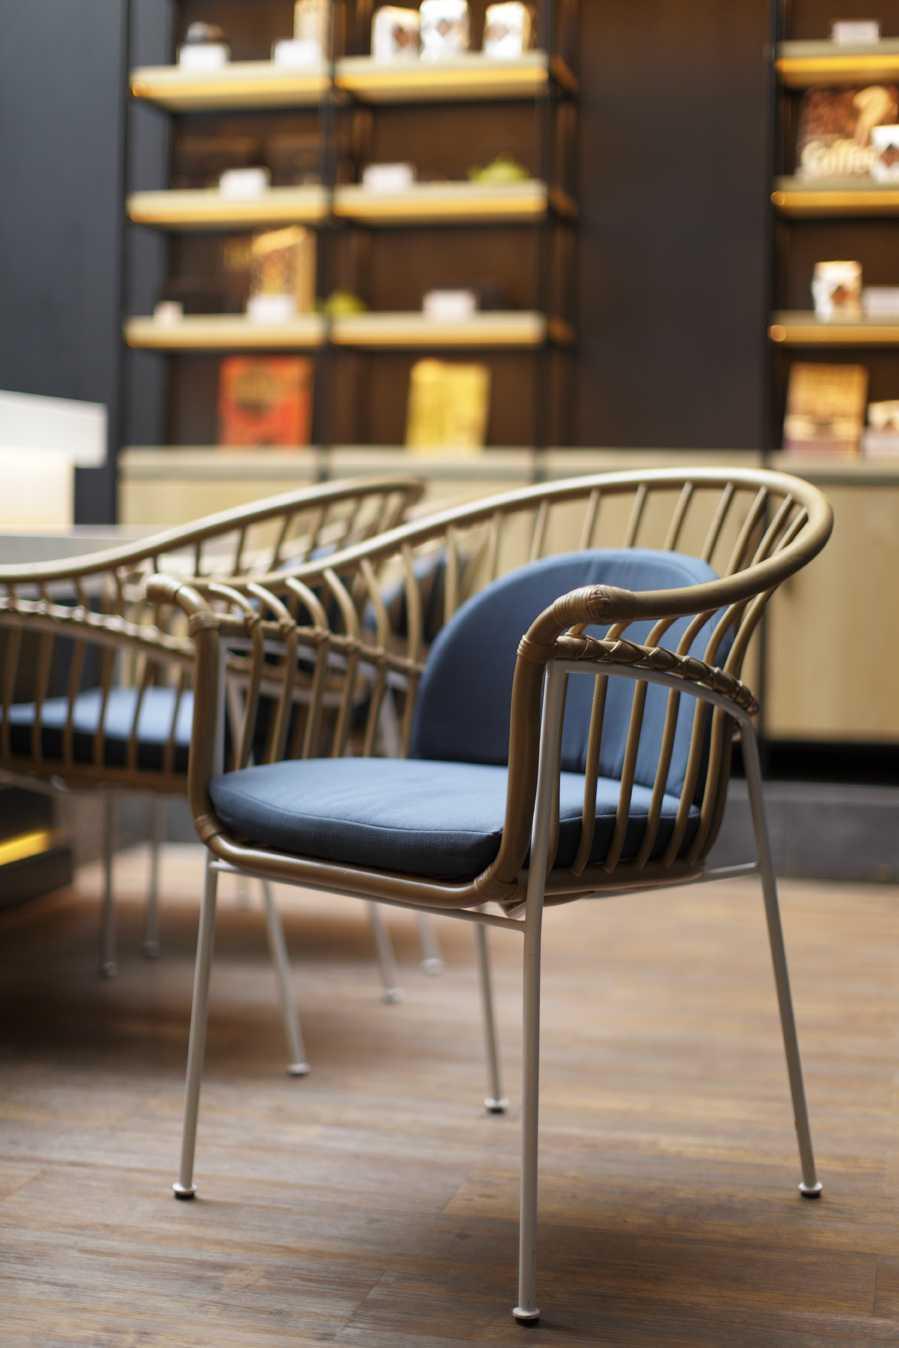 Alvin Tjitrowirjo, Alvint Studio Le Gourmand Cafe  Gunawarman Jakarta  Gunawarman Jakarta  Chair Details Contemporary  15667